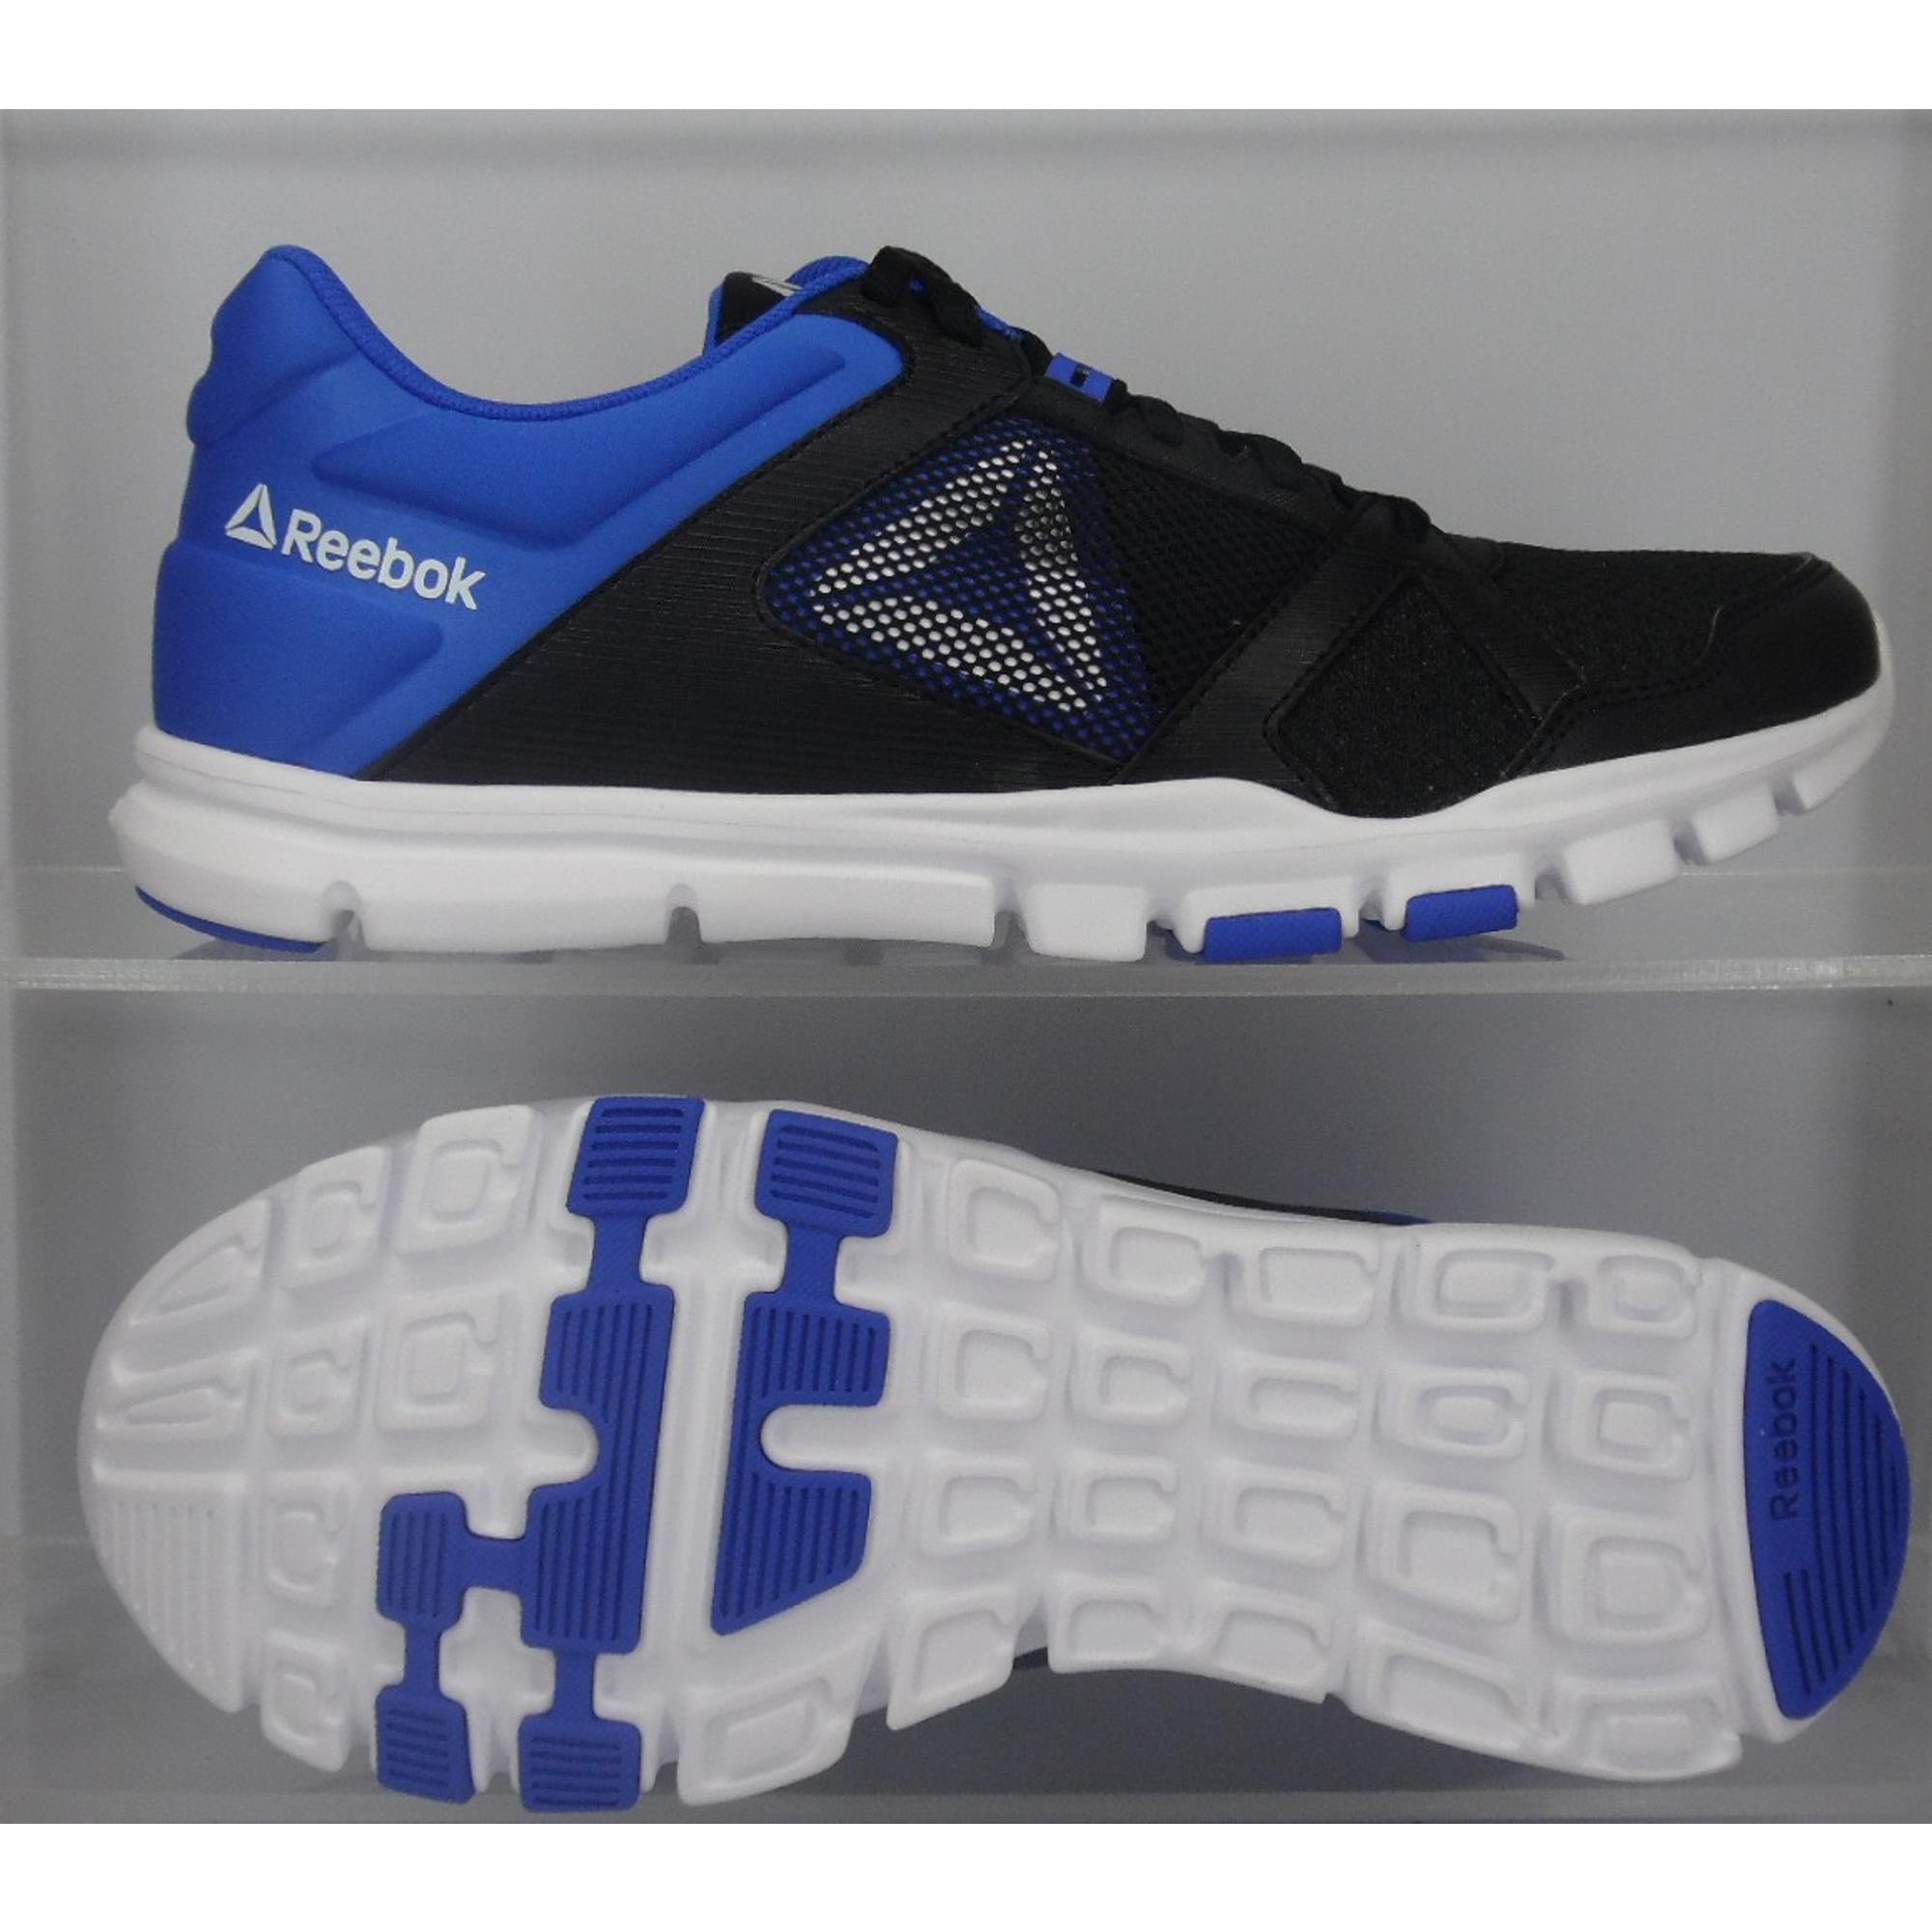 8139a5fdf66c84 Chaussures Reebok Yourflex Train 10 Mt